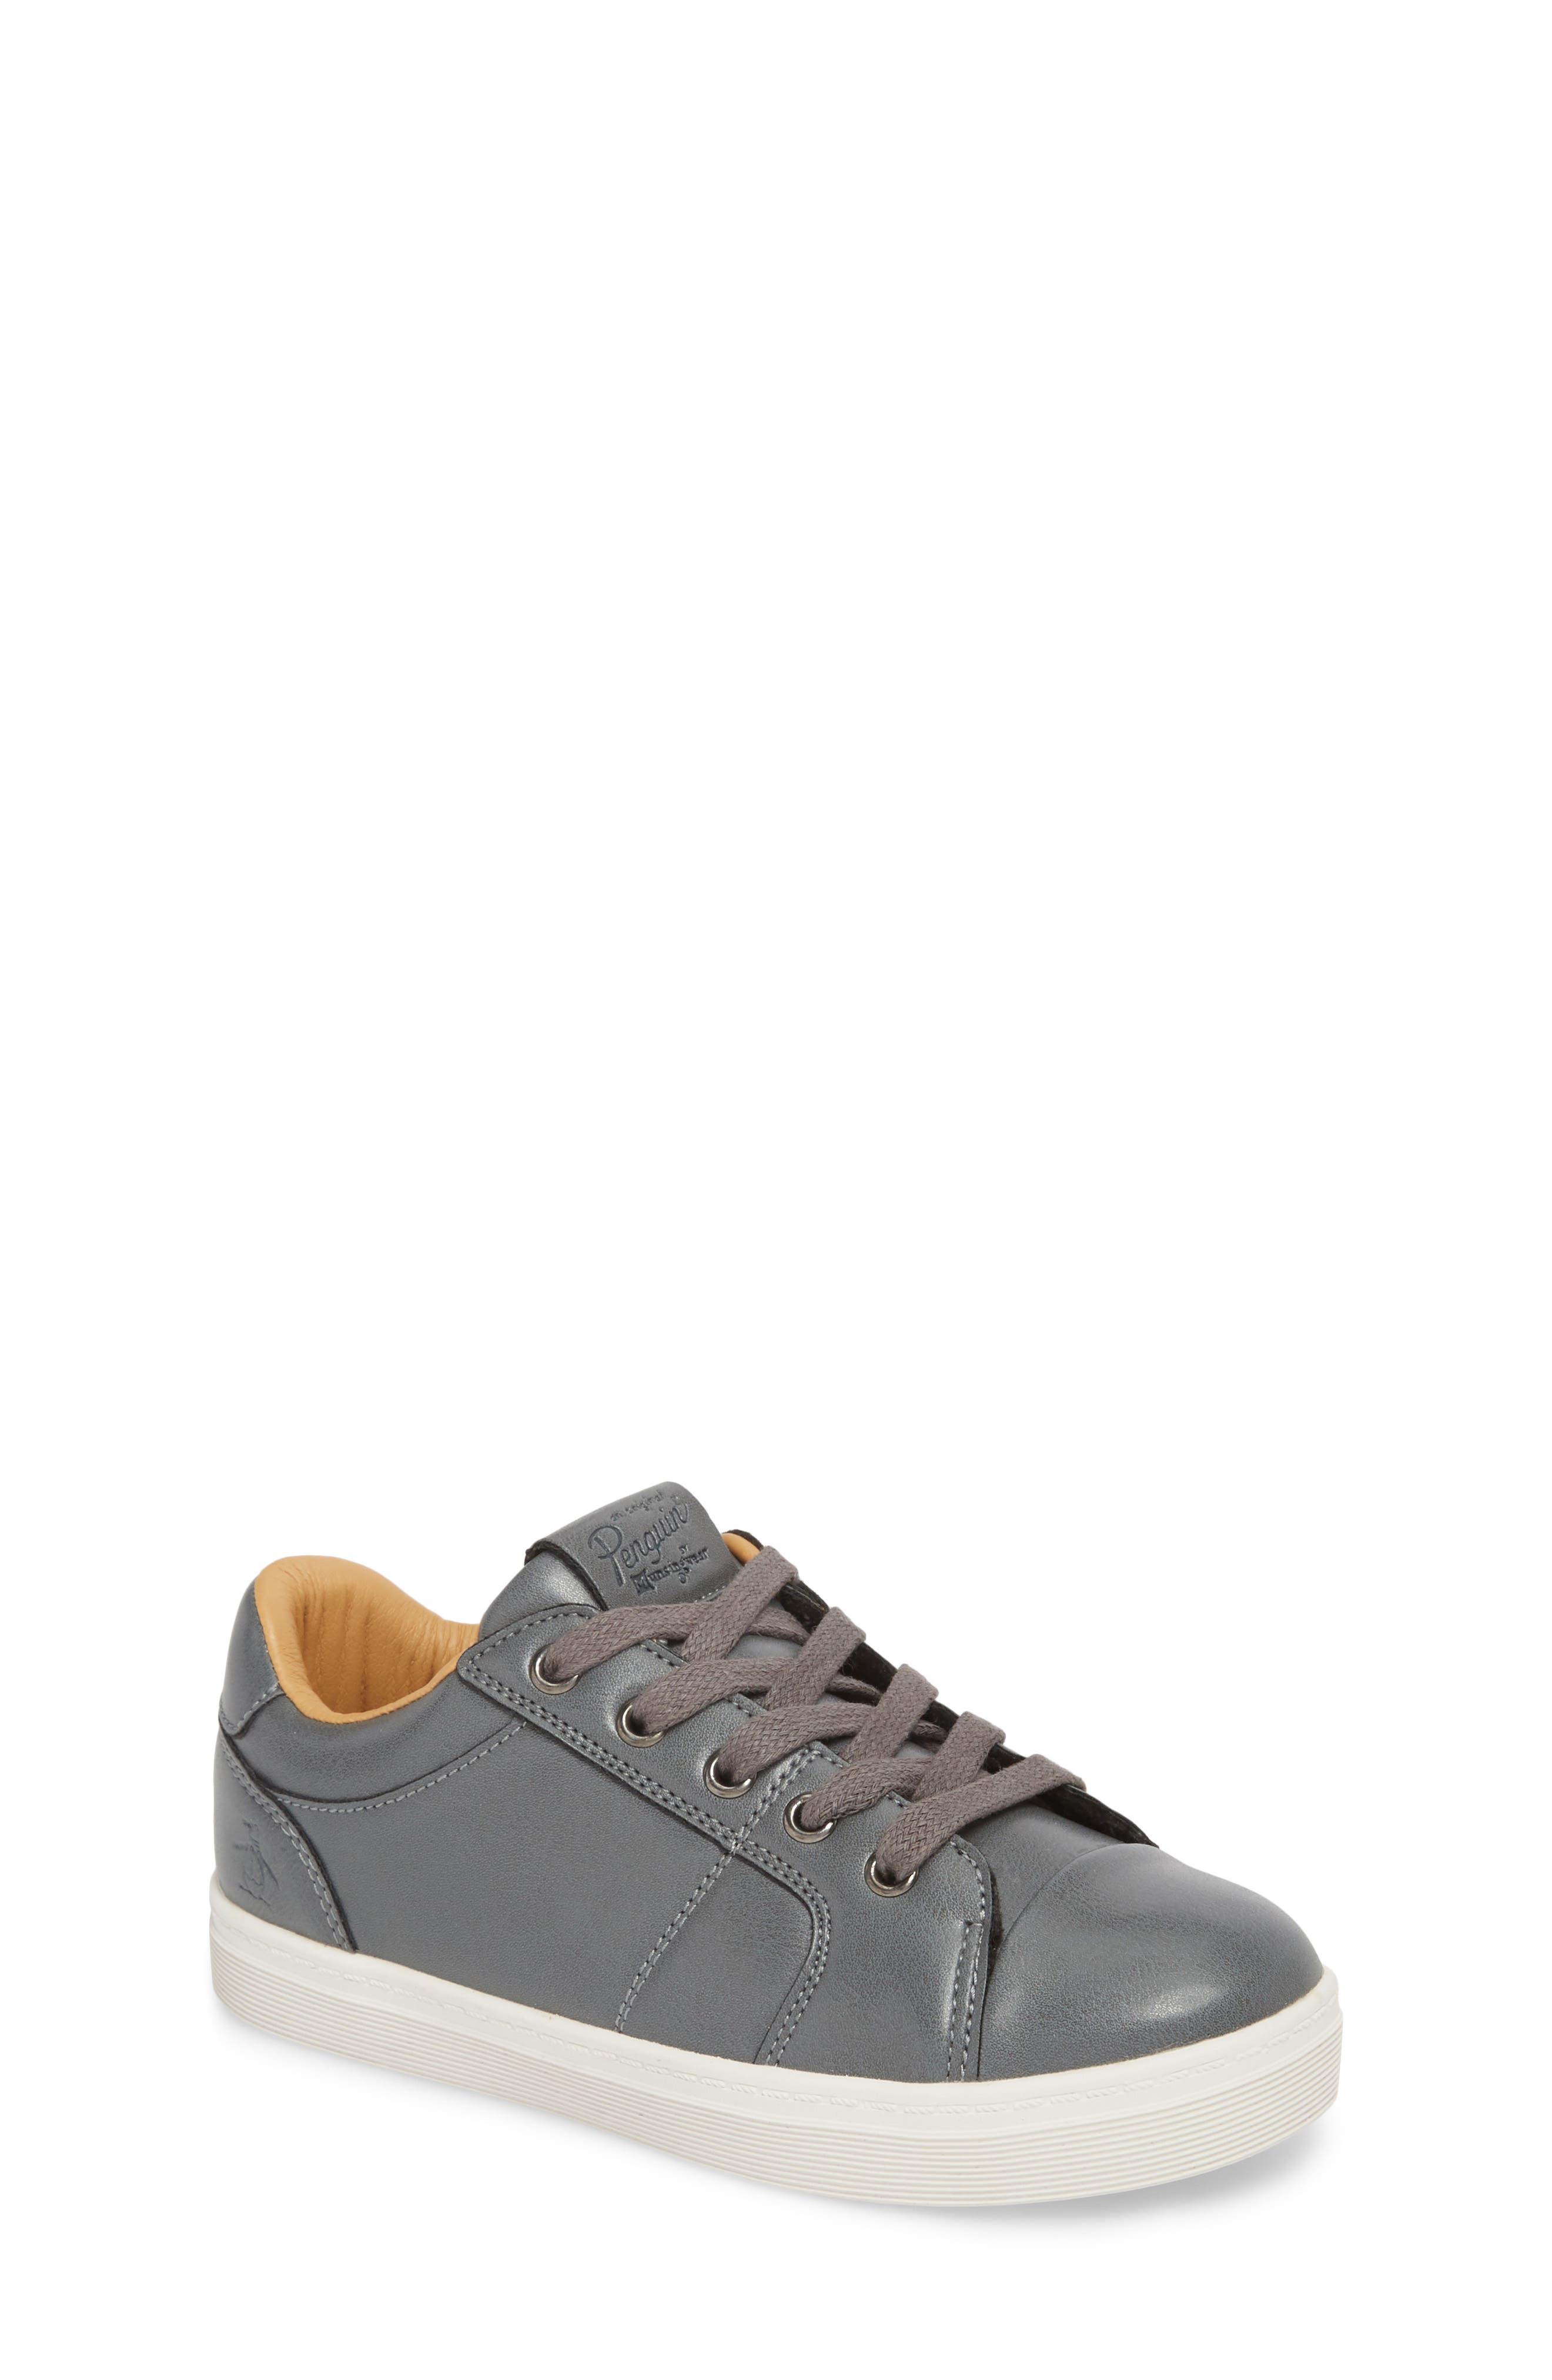 Cobin Sneaker,                             Main thumbnail 1, color,                             020